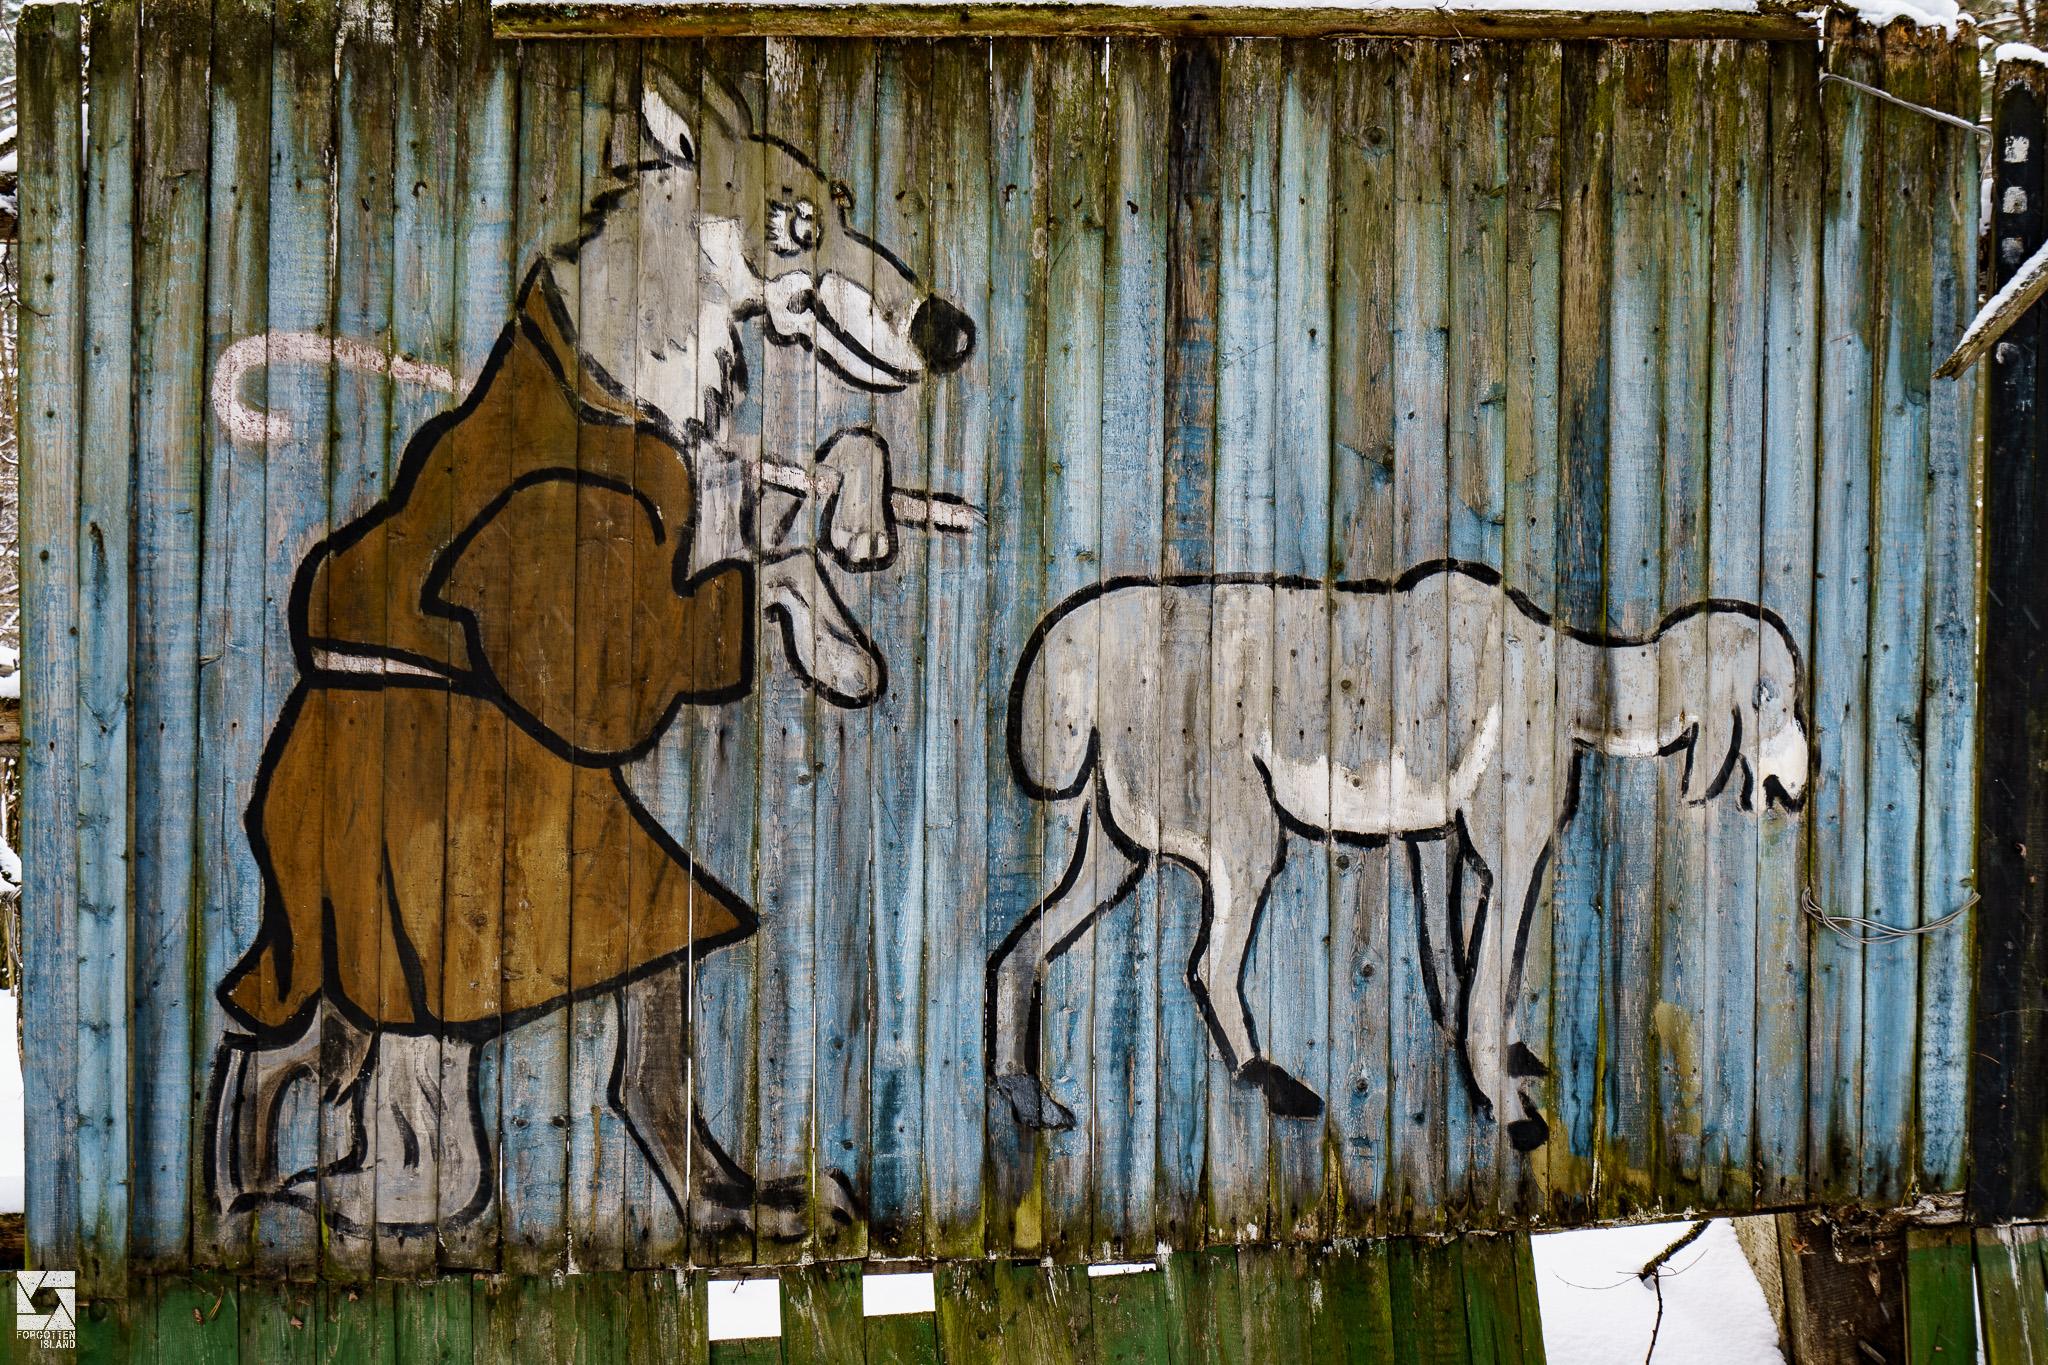 Chernobyl-2 Playground Artwork